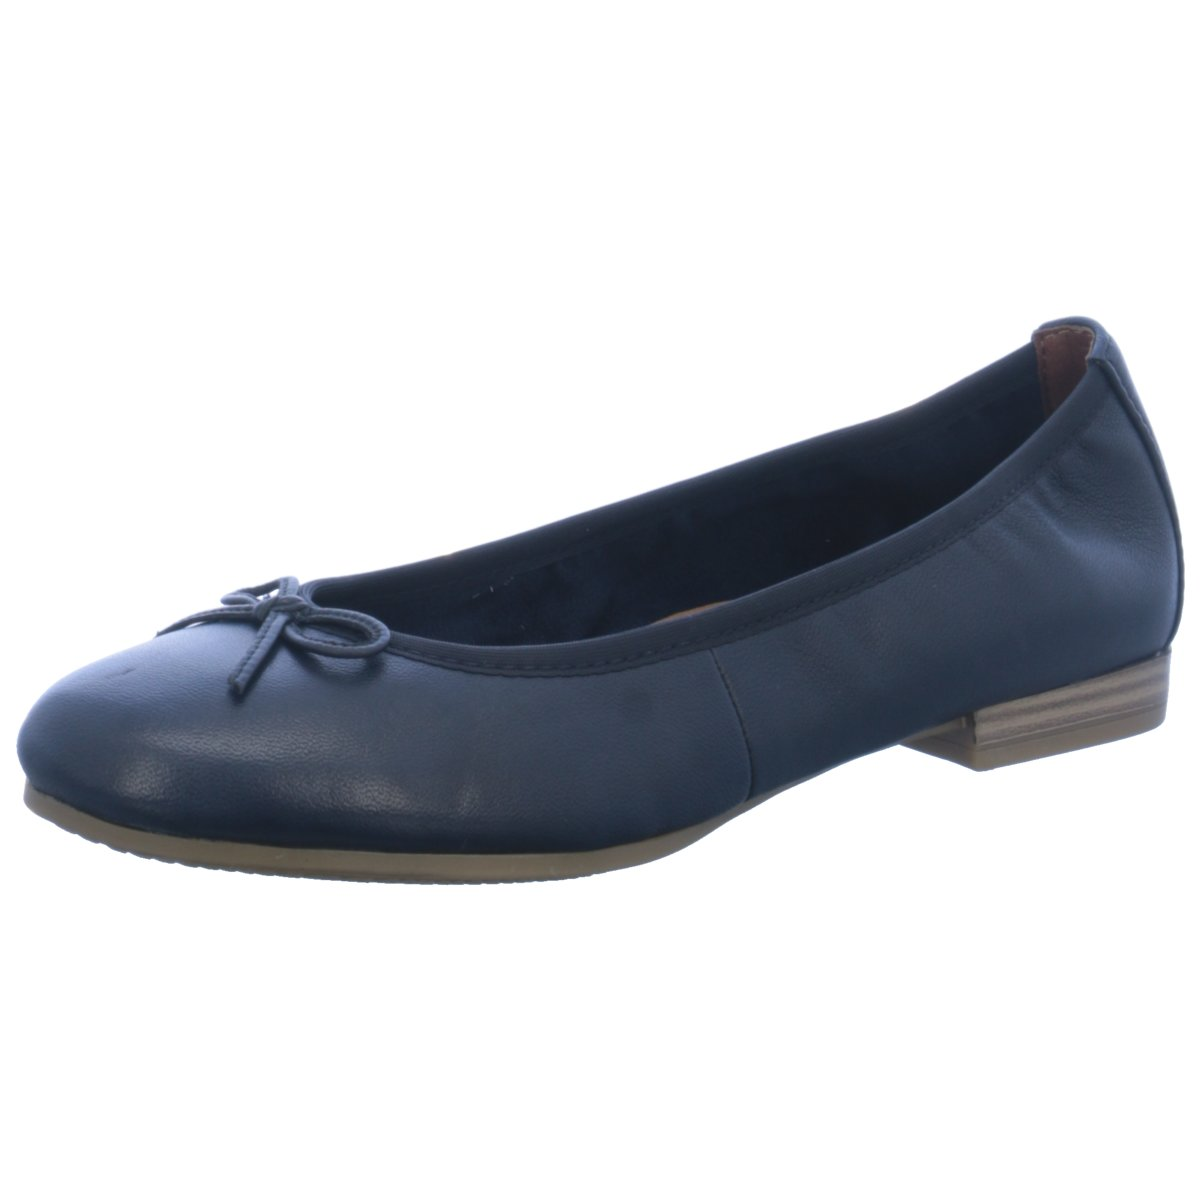 Details zu Tamaris Damen Ballerinas Ballerina 1 22116 20 848 blau 387531